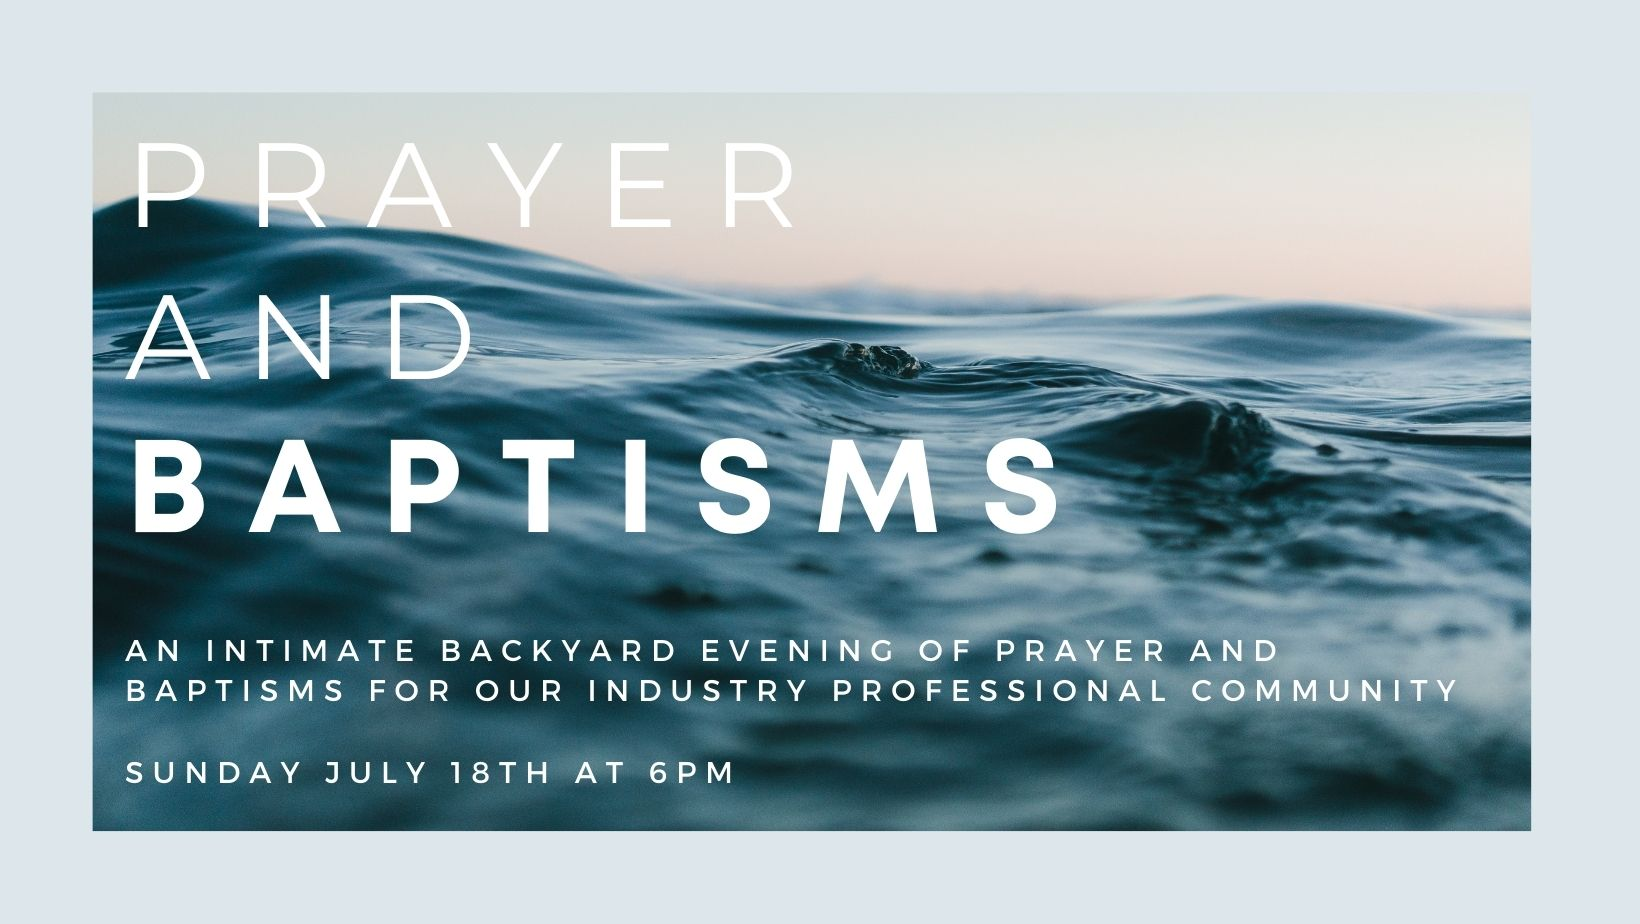 Prayer and Baptisms